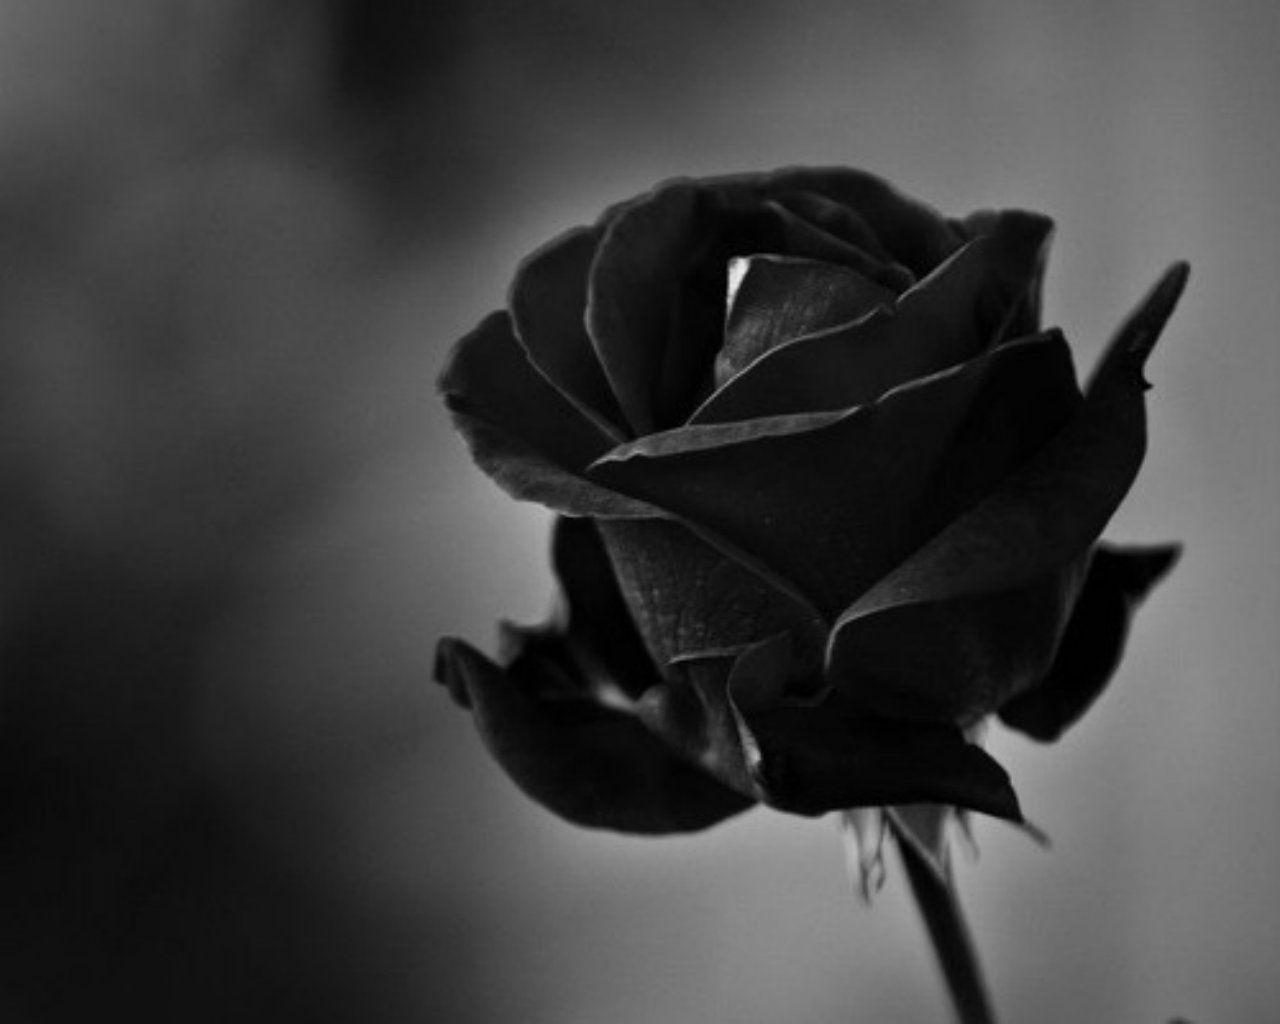 Black Rose Wallpapers Top Free Black Rose Backgrounds Wallpaperaccess